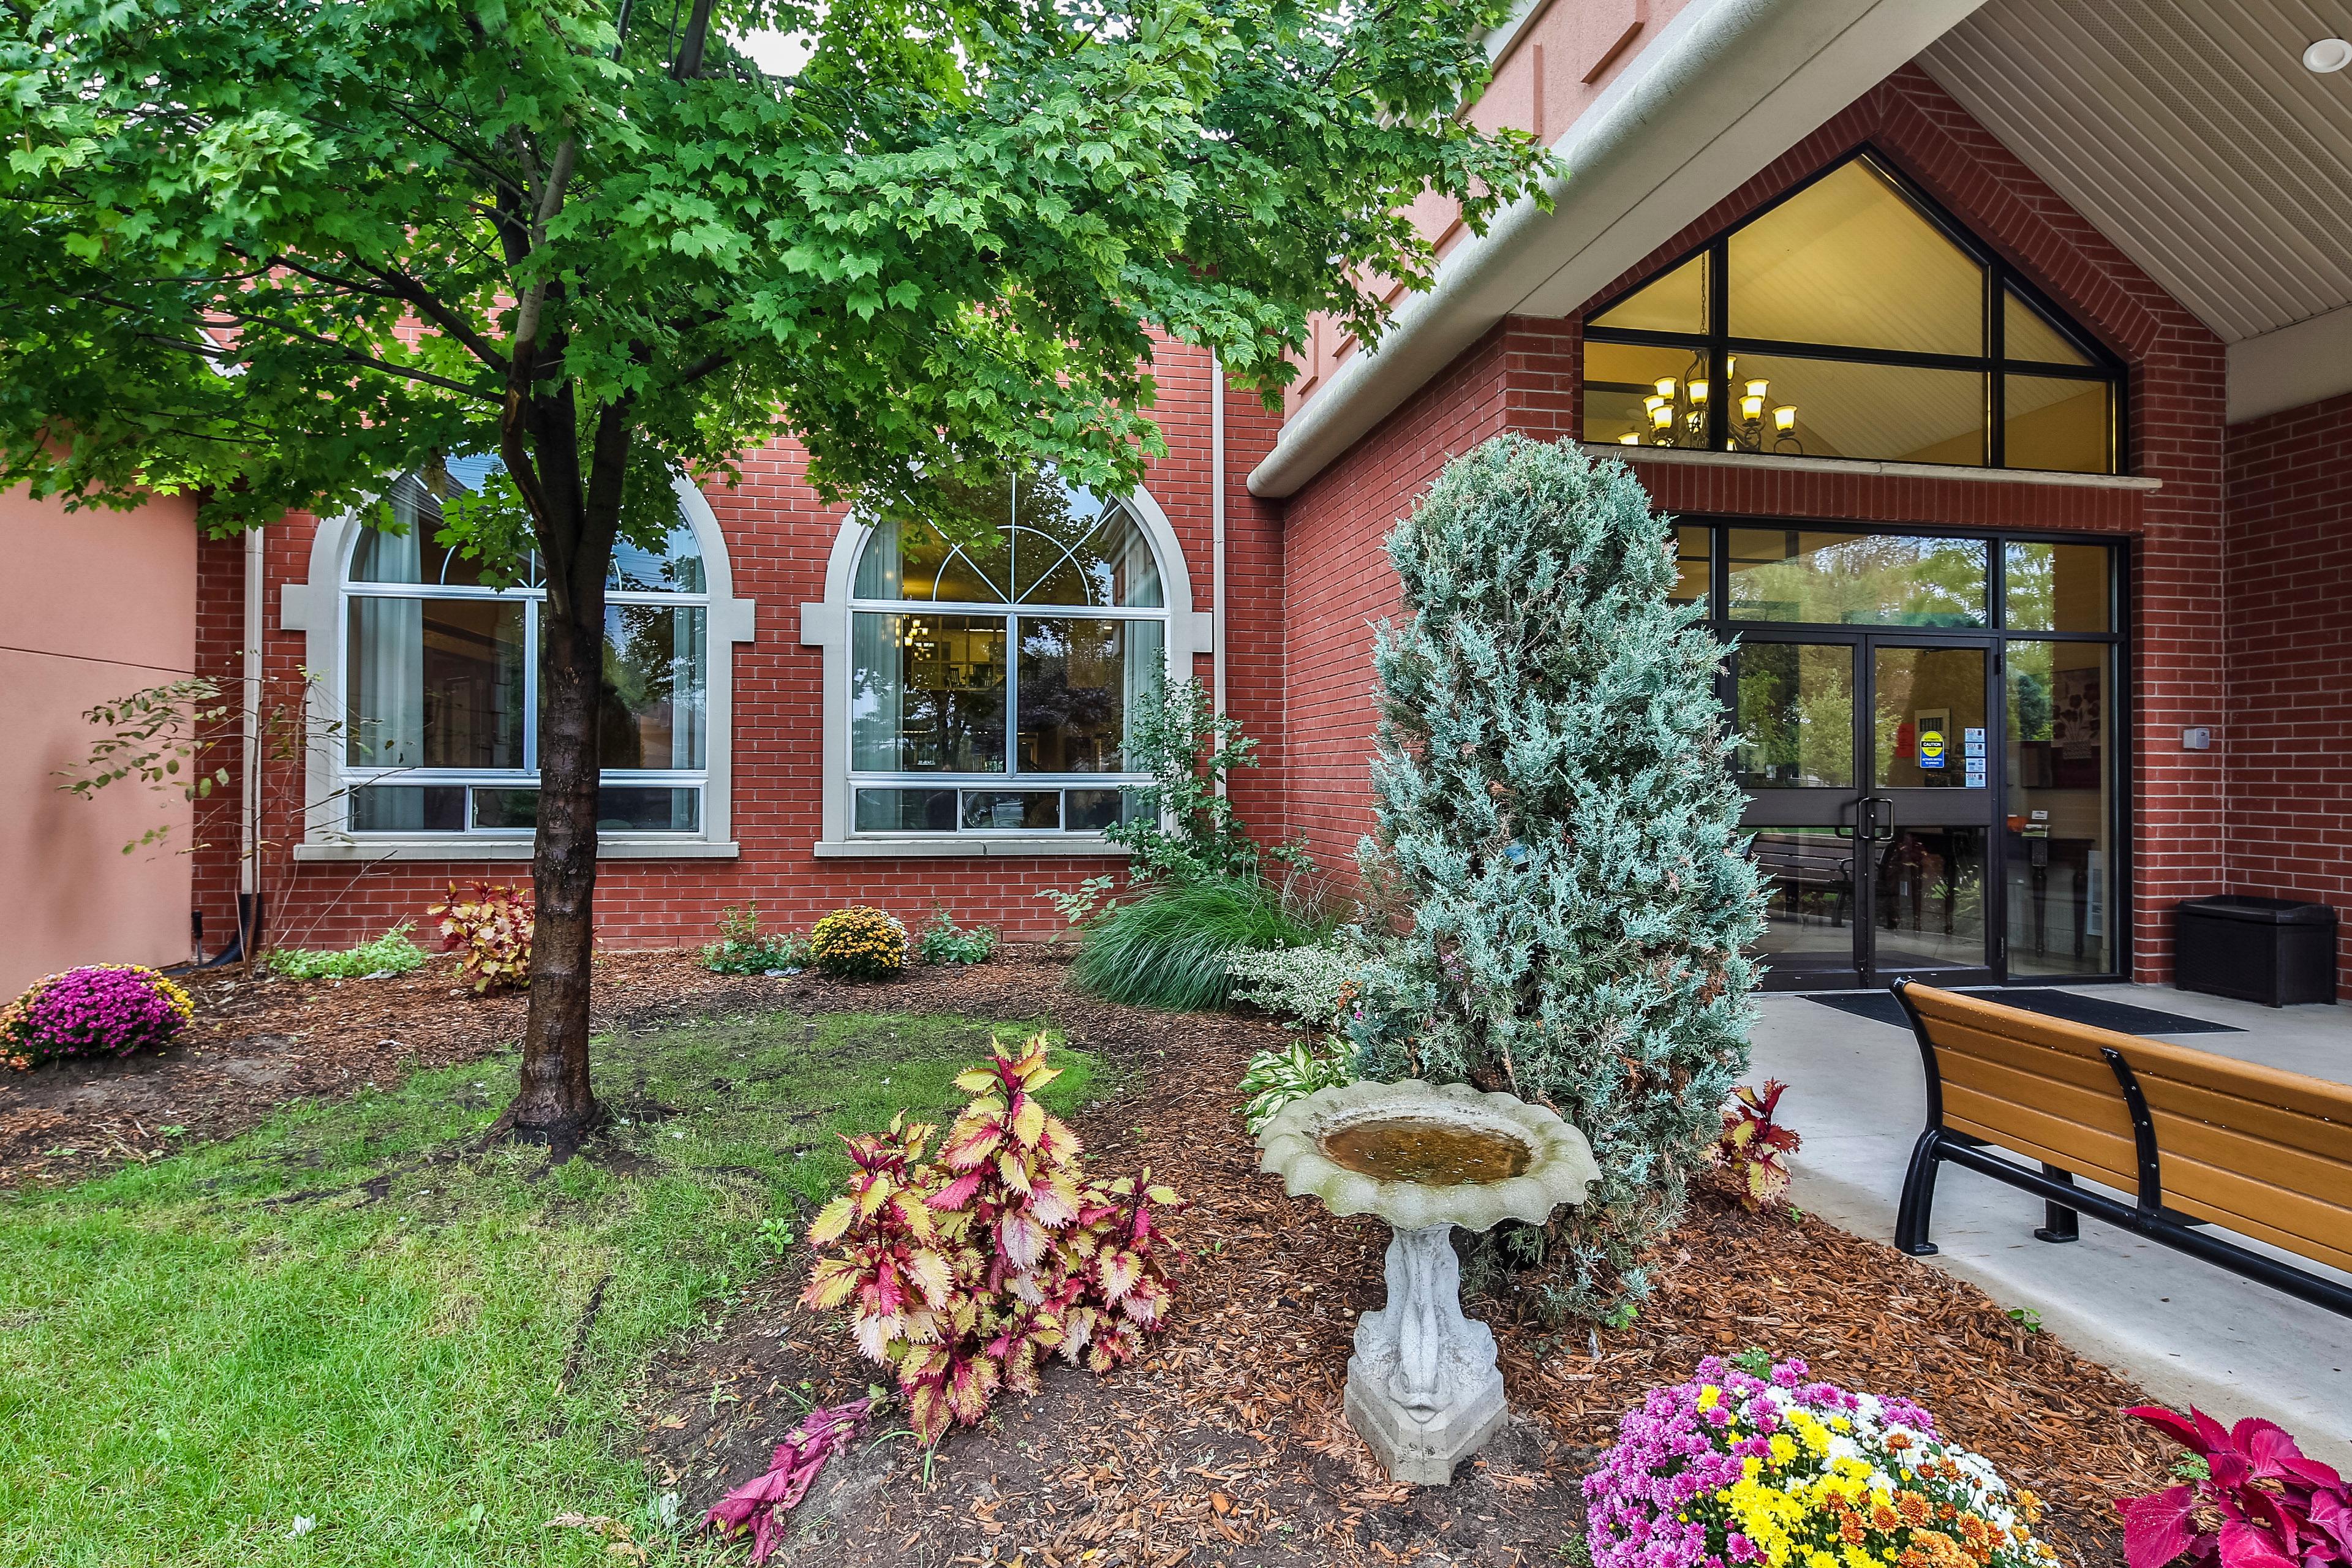 Revera Plymouth Cordage Retirement Residence